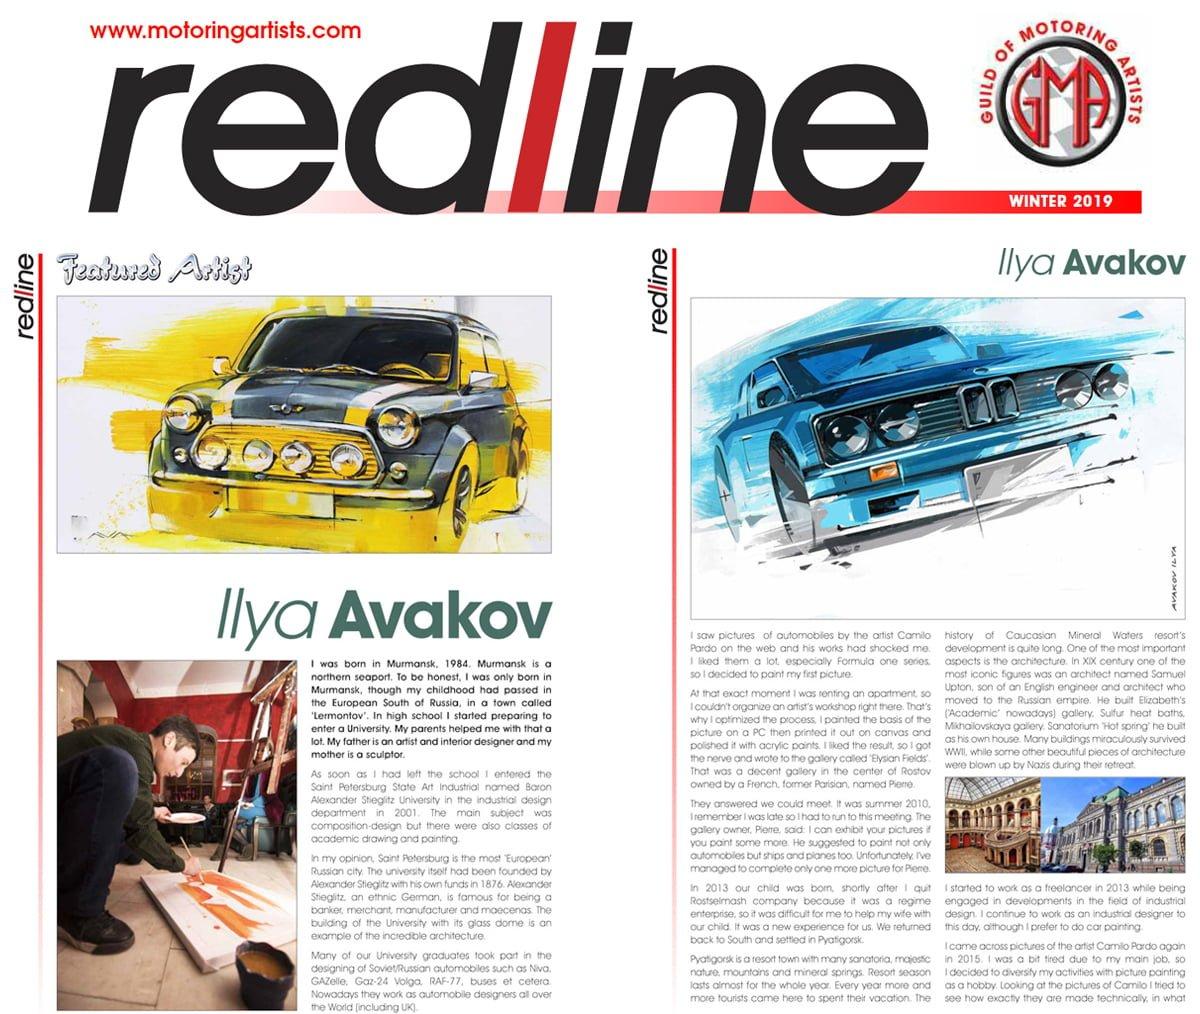 Publication in magazine Guild Motoring Artist Uk, featured artist  Ilya Avakov